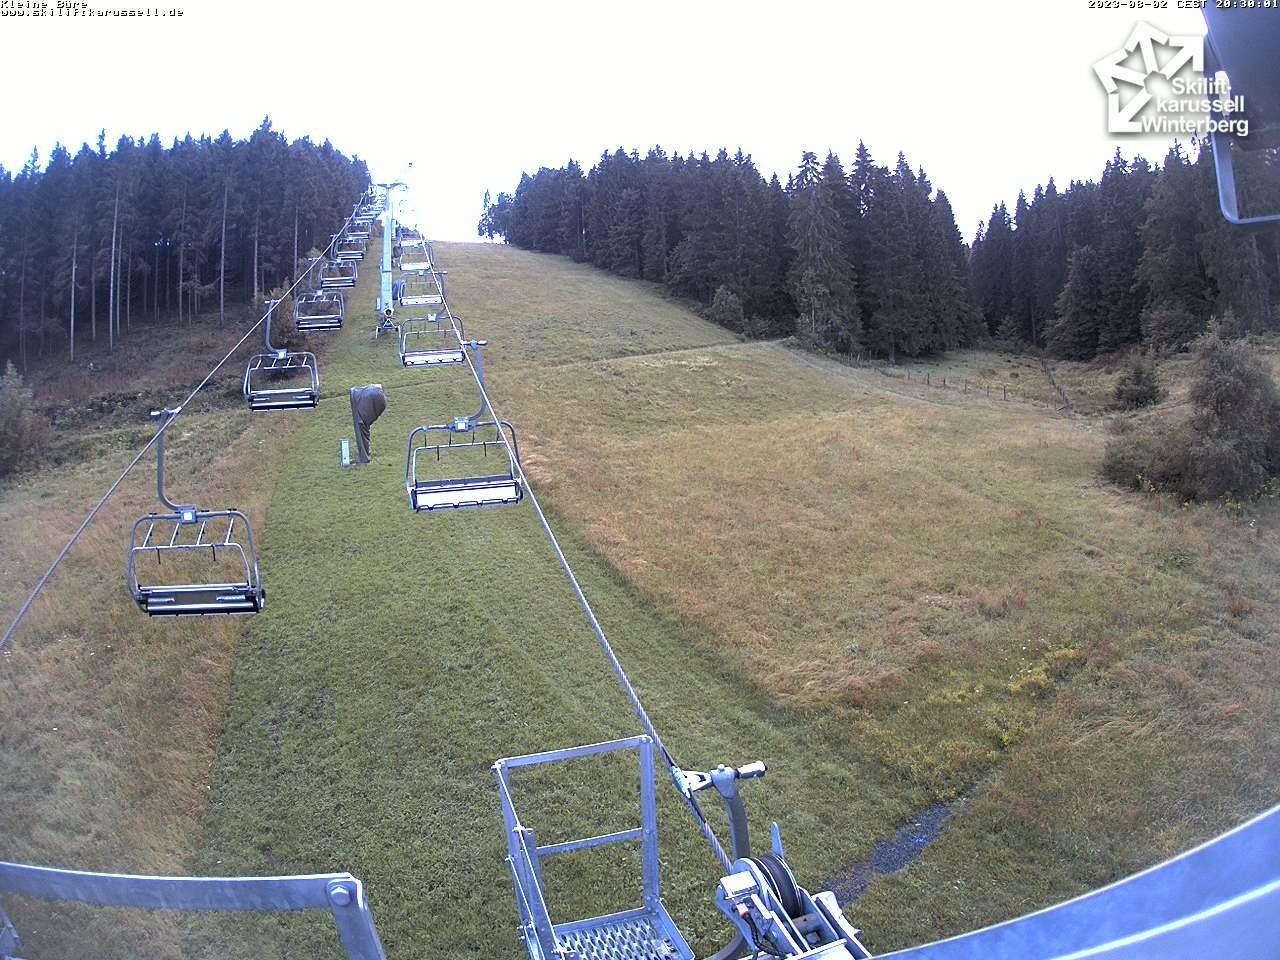 Webcam Winterberg Blick Auf Den Sessellift Kleine Bure Sauerland